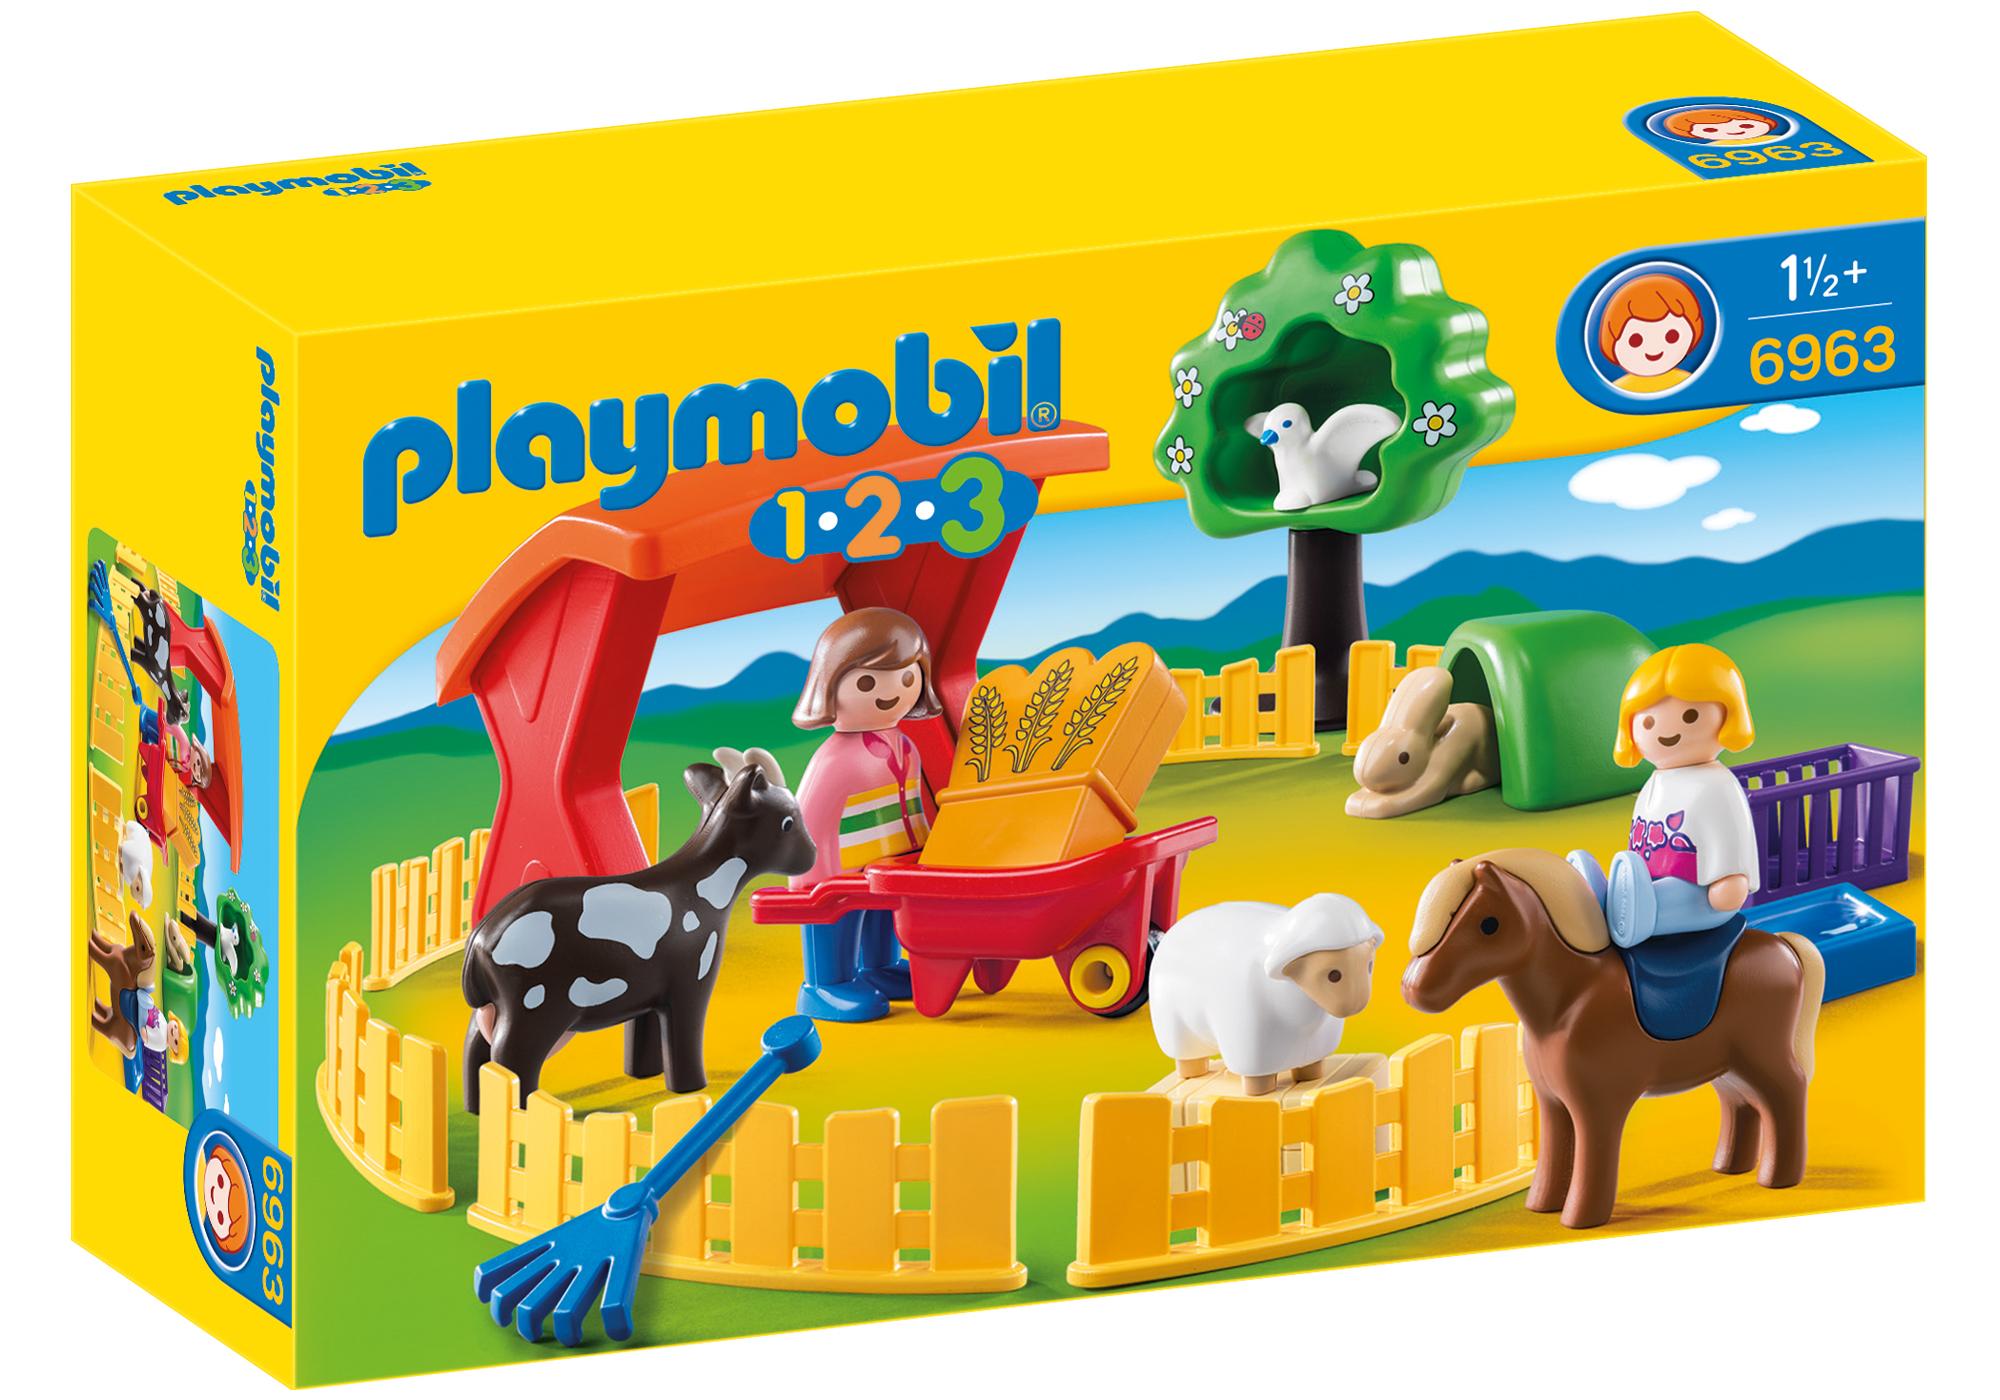 http://media.playmobil.com/i/playmobil/6963_product_box_front/1.2.3 Recinto de Animales